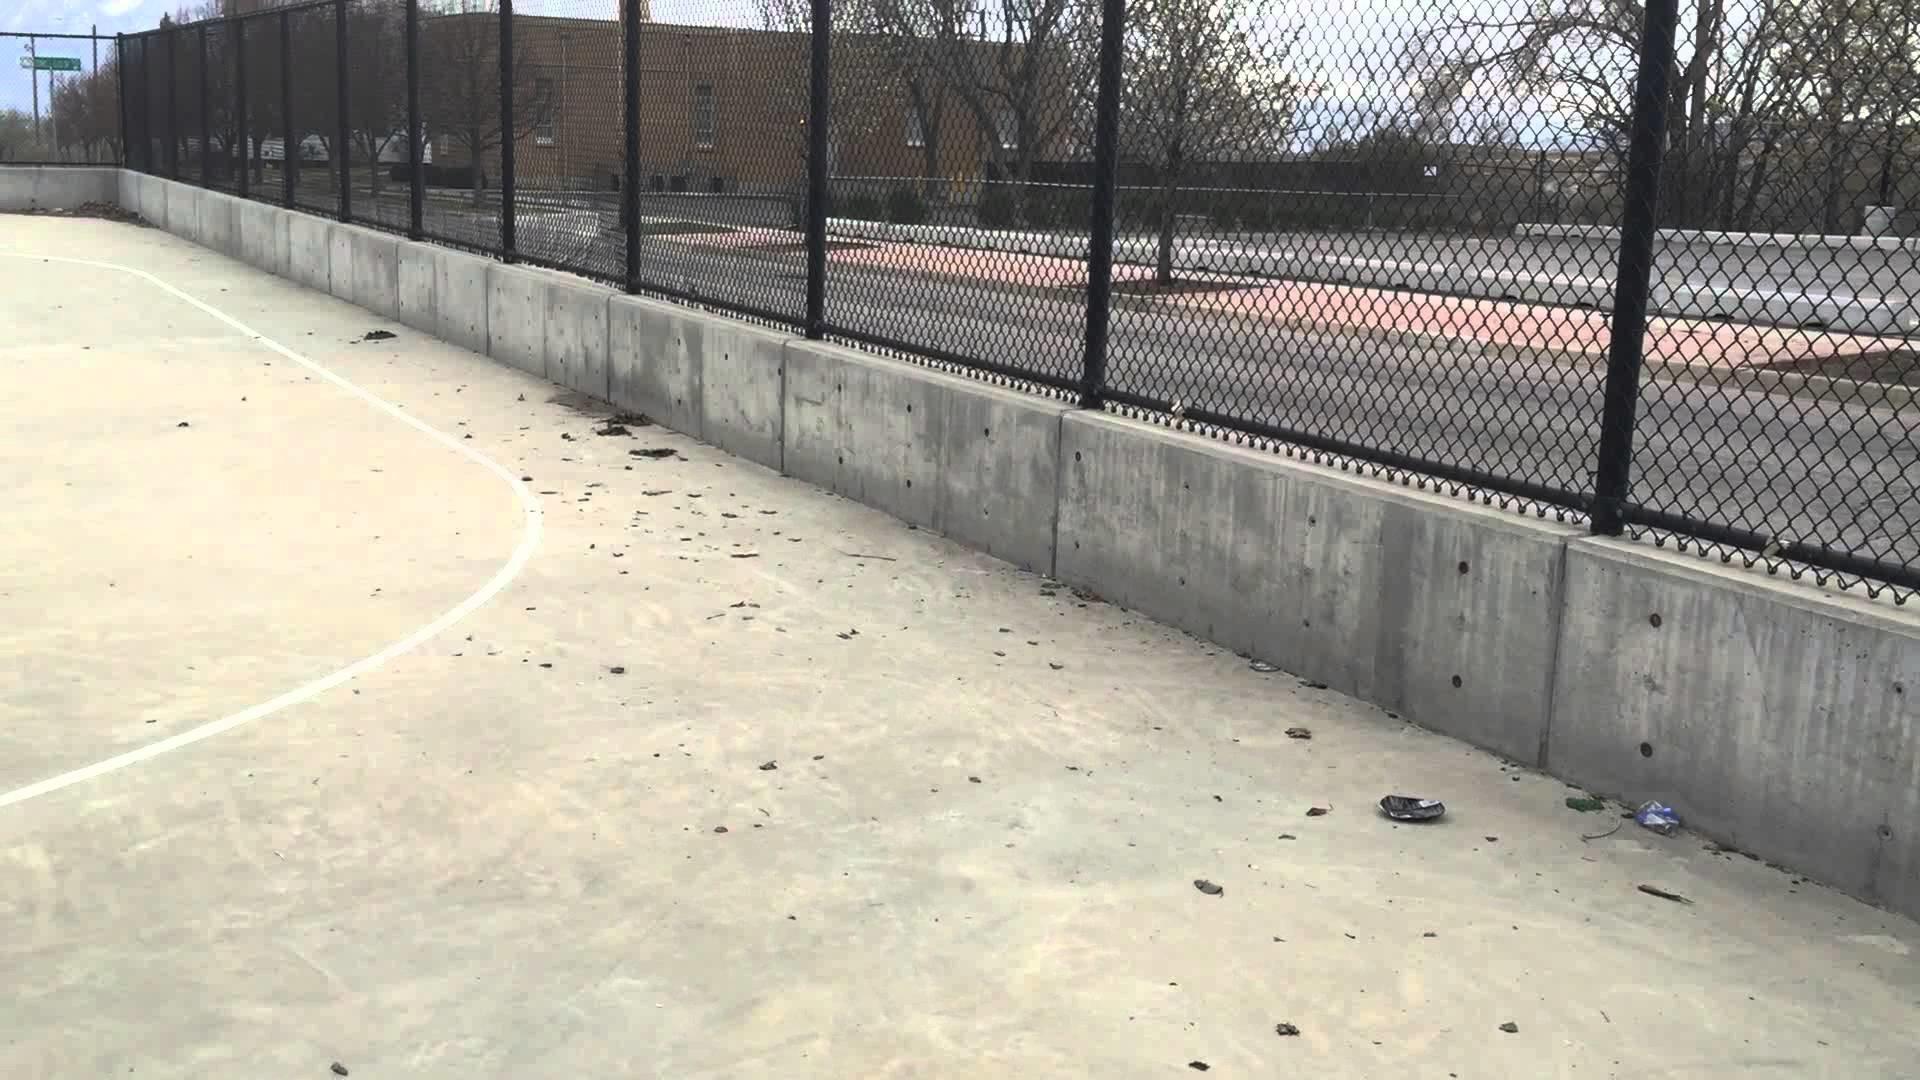 Outdoor Roller Hockey Rink in the Salt Lake Valley (Copperton, UT)